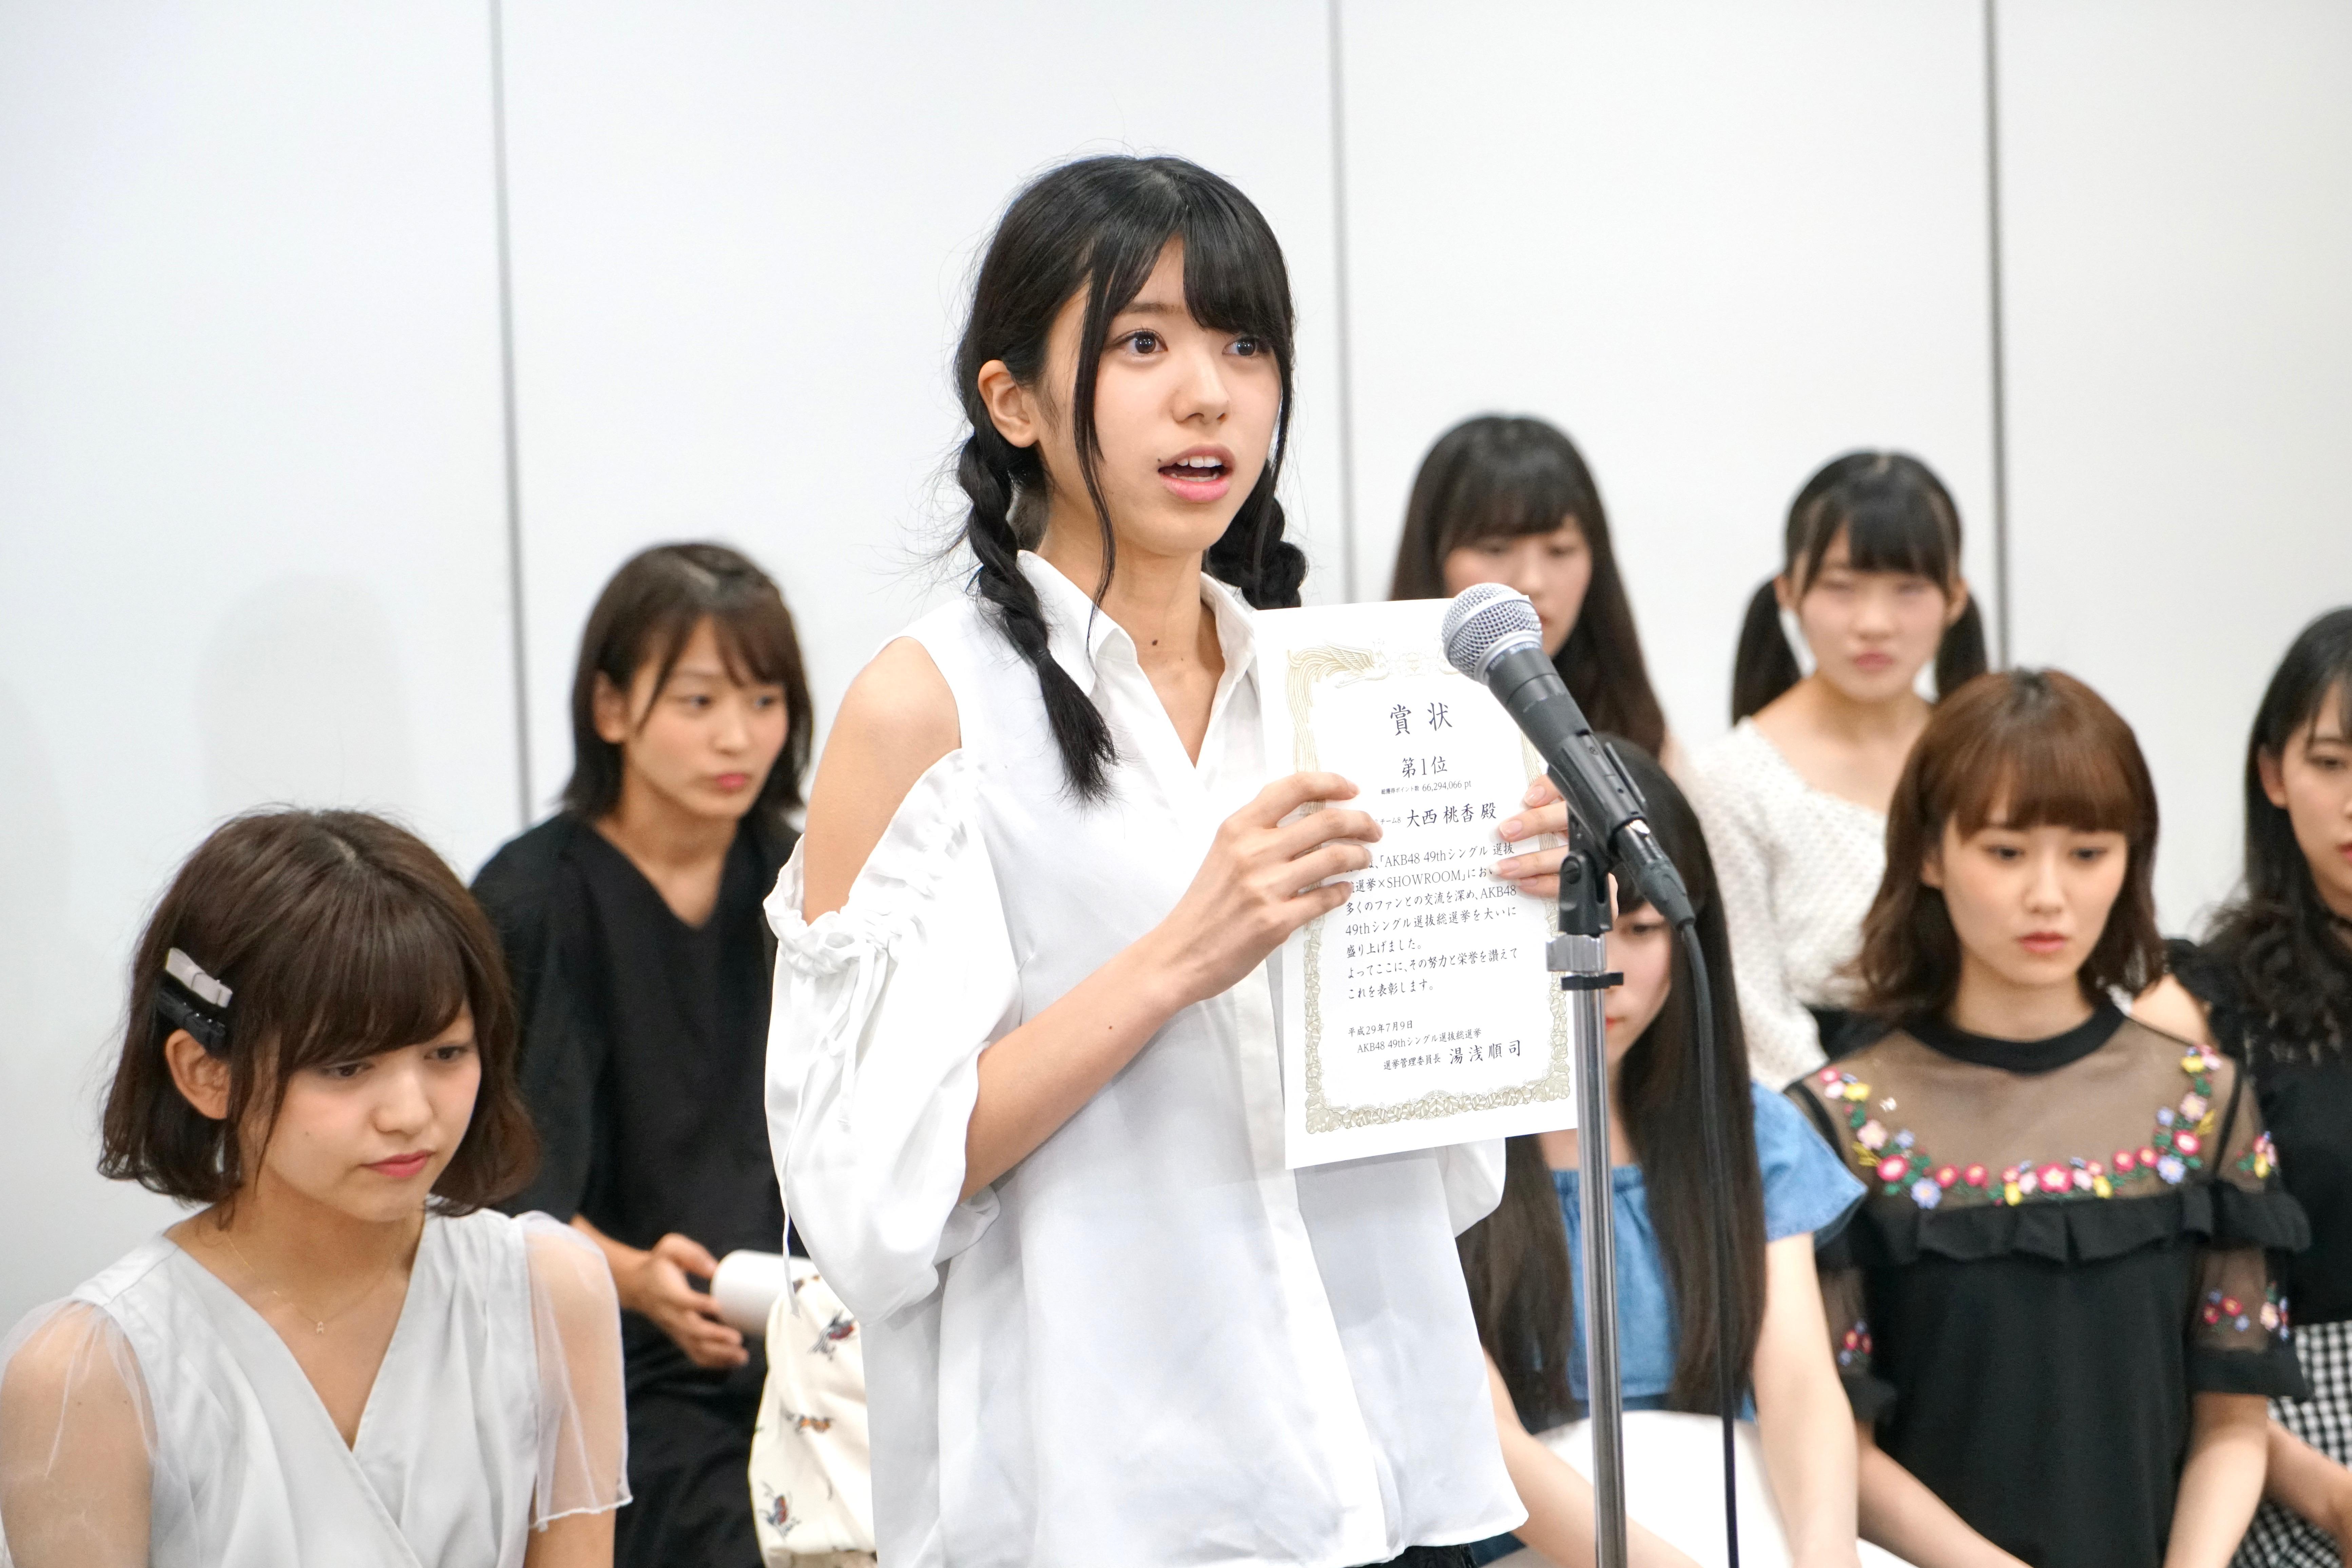 SHOWROOMのアピールイベントで1位を獲得したことを表彰される大西桃香(中央)